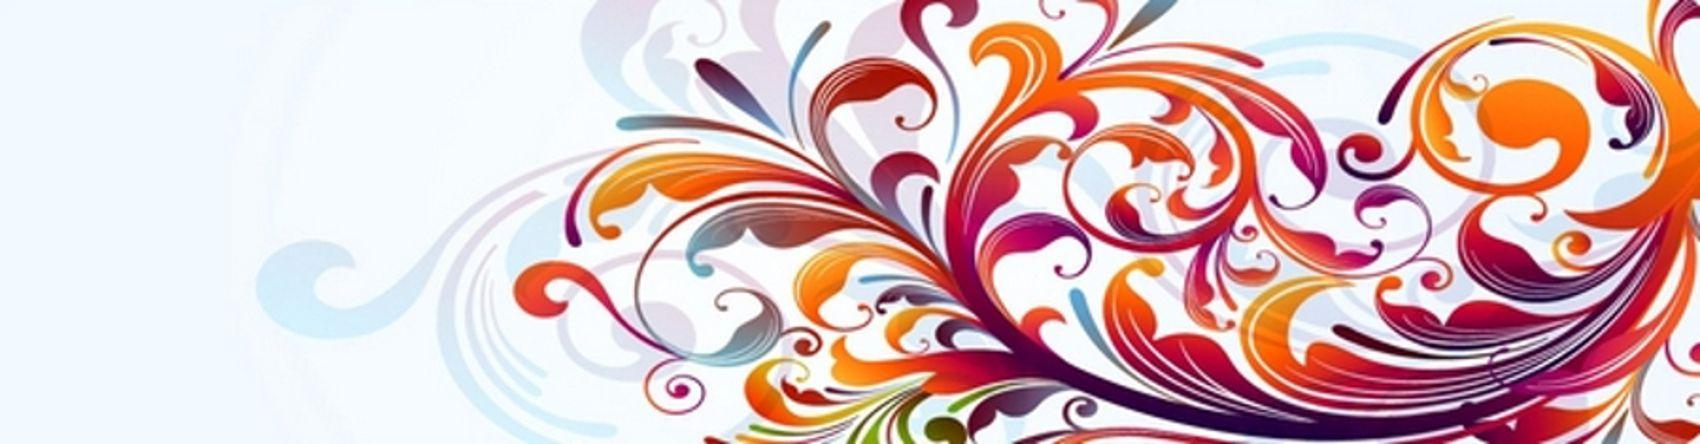 разноцветная абстрактная ветка